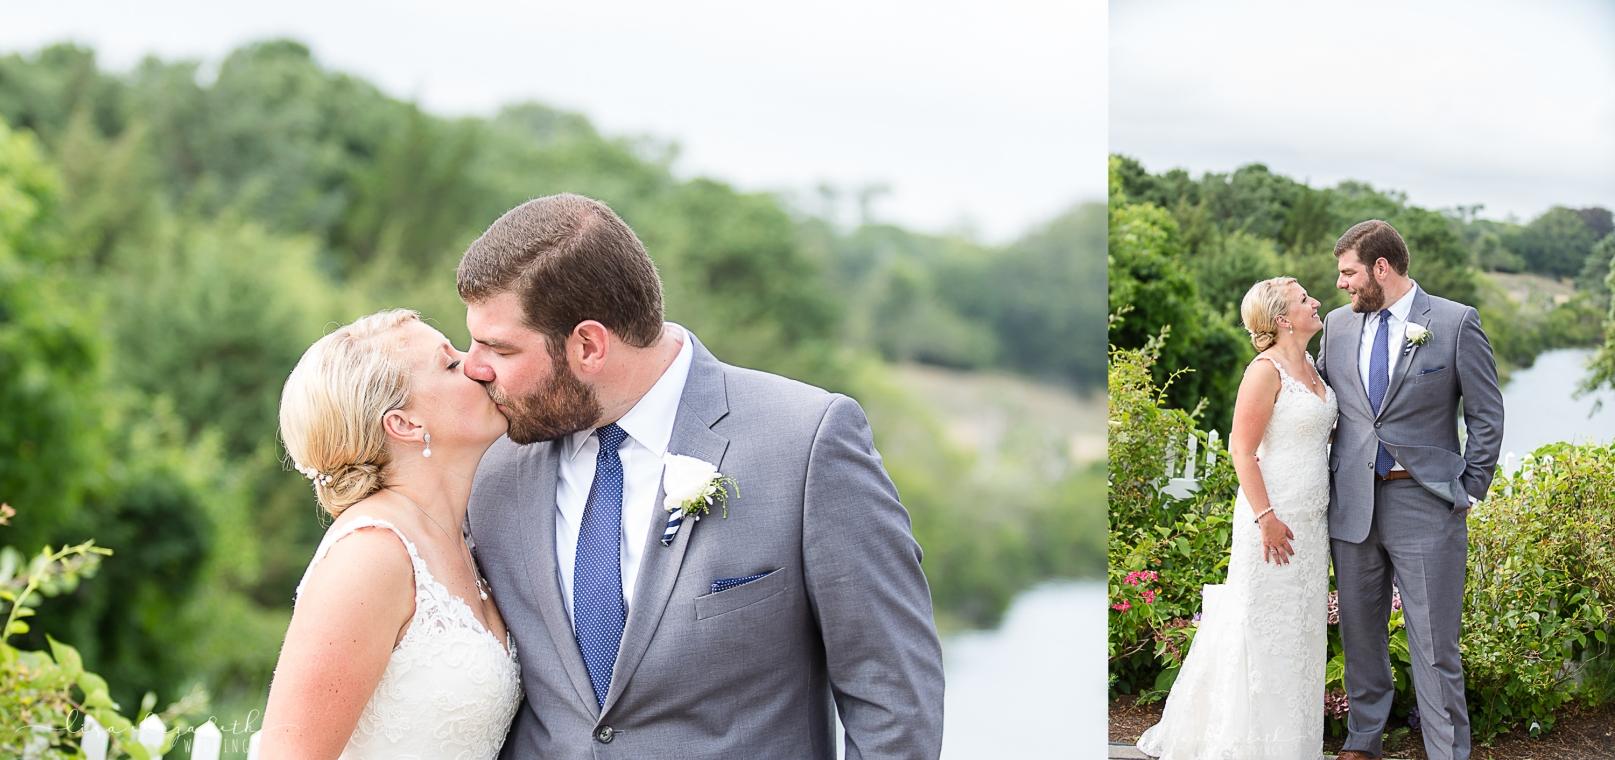 ©Lisa Elizabeth Images-Cape Cod Wedding Photographer-23